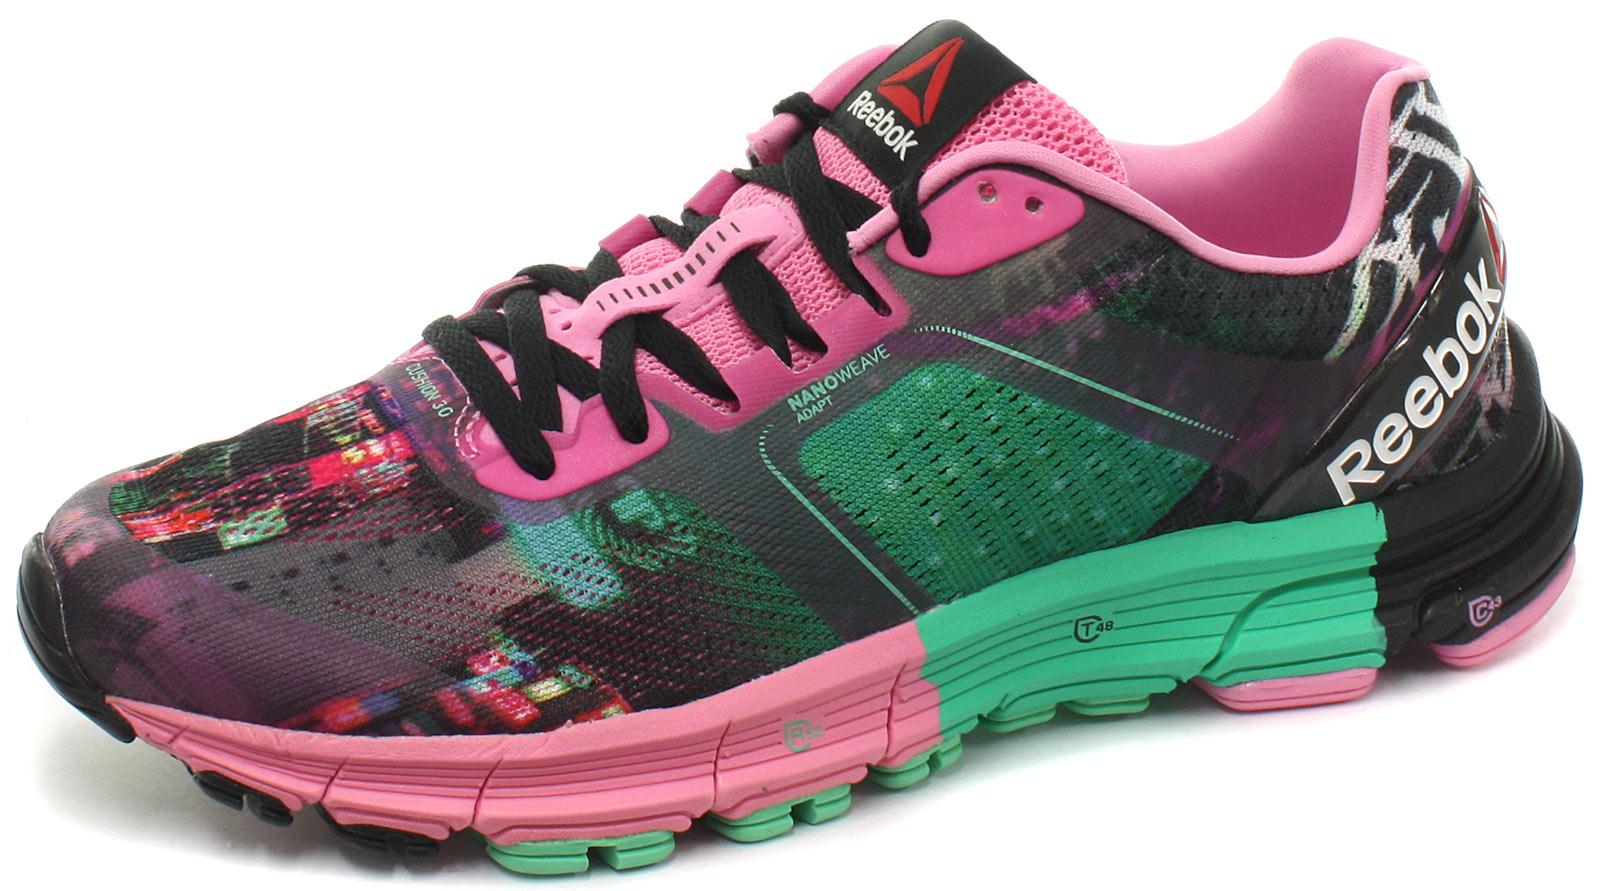 0 Reebok Shoes UK Cushion Trainers 3 CG Womens Running One Size pLqUzMVSG